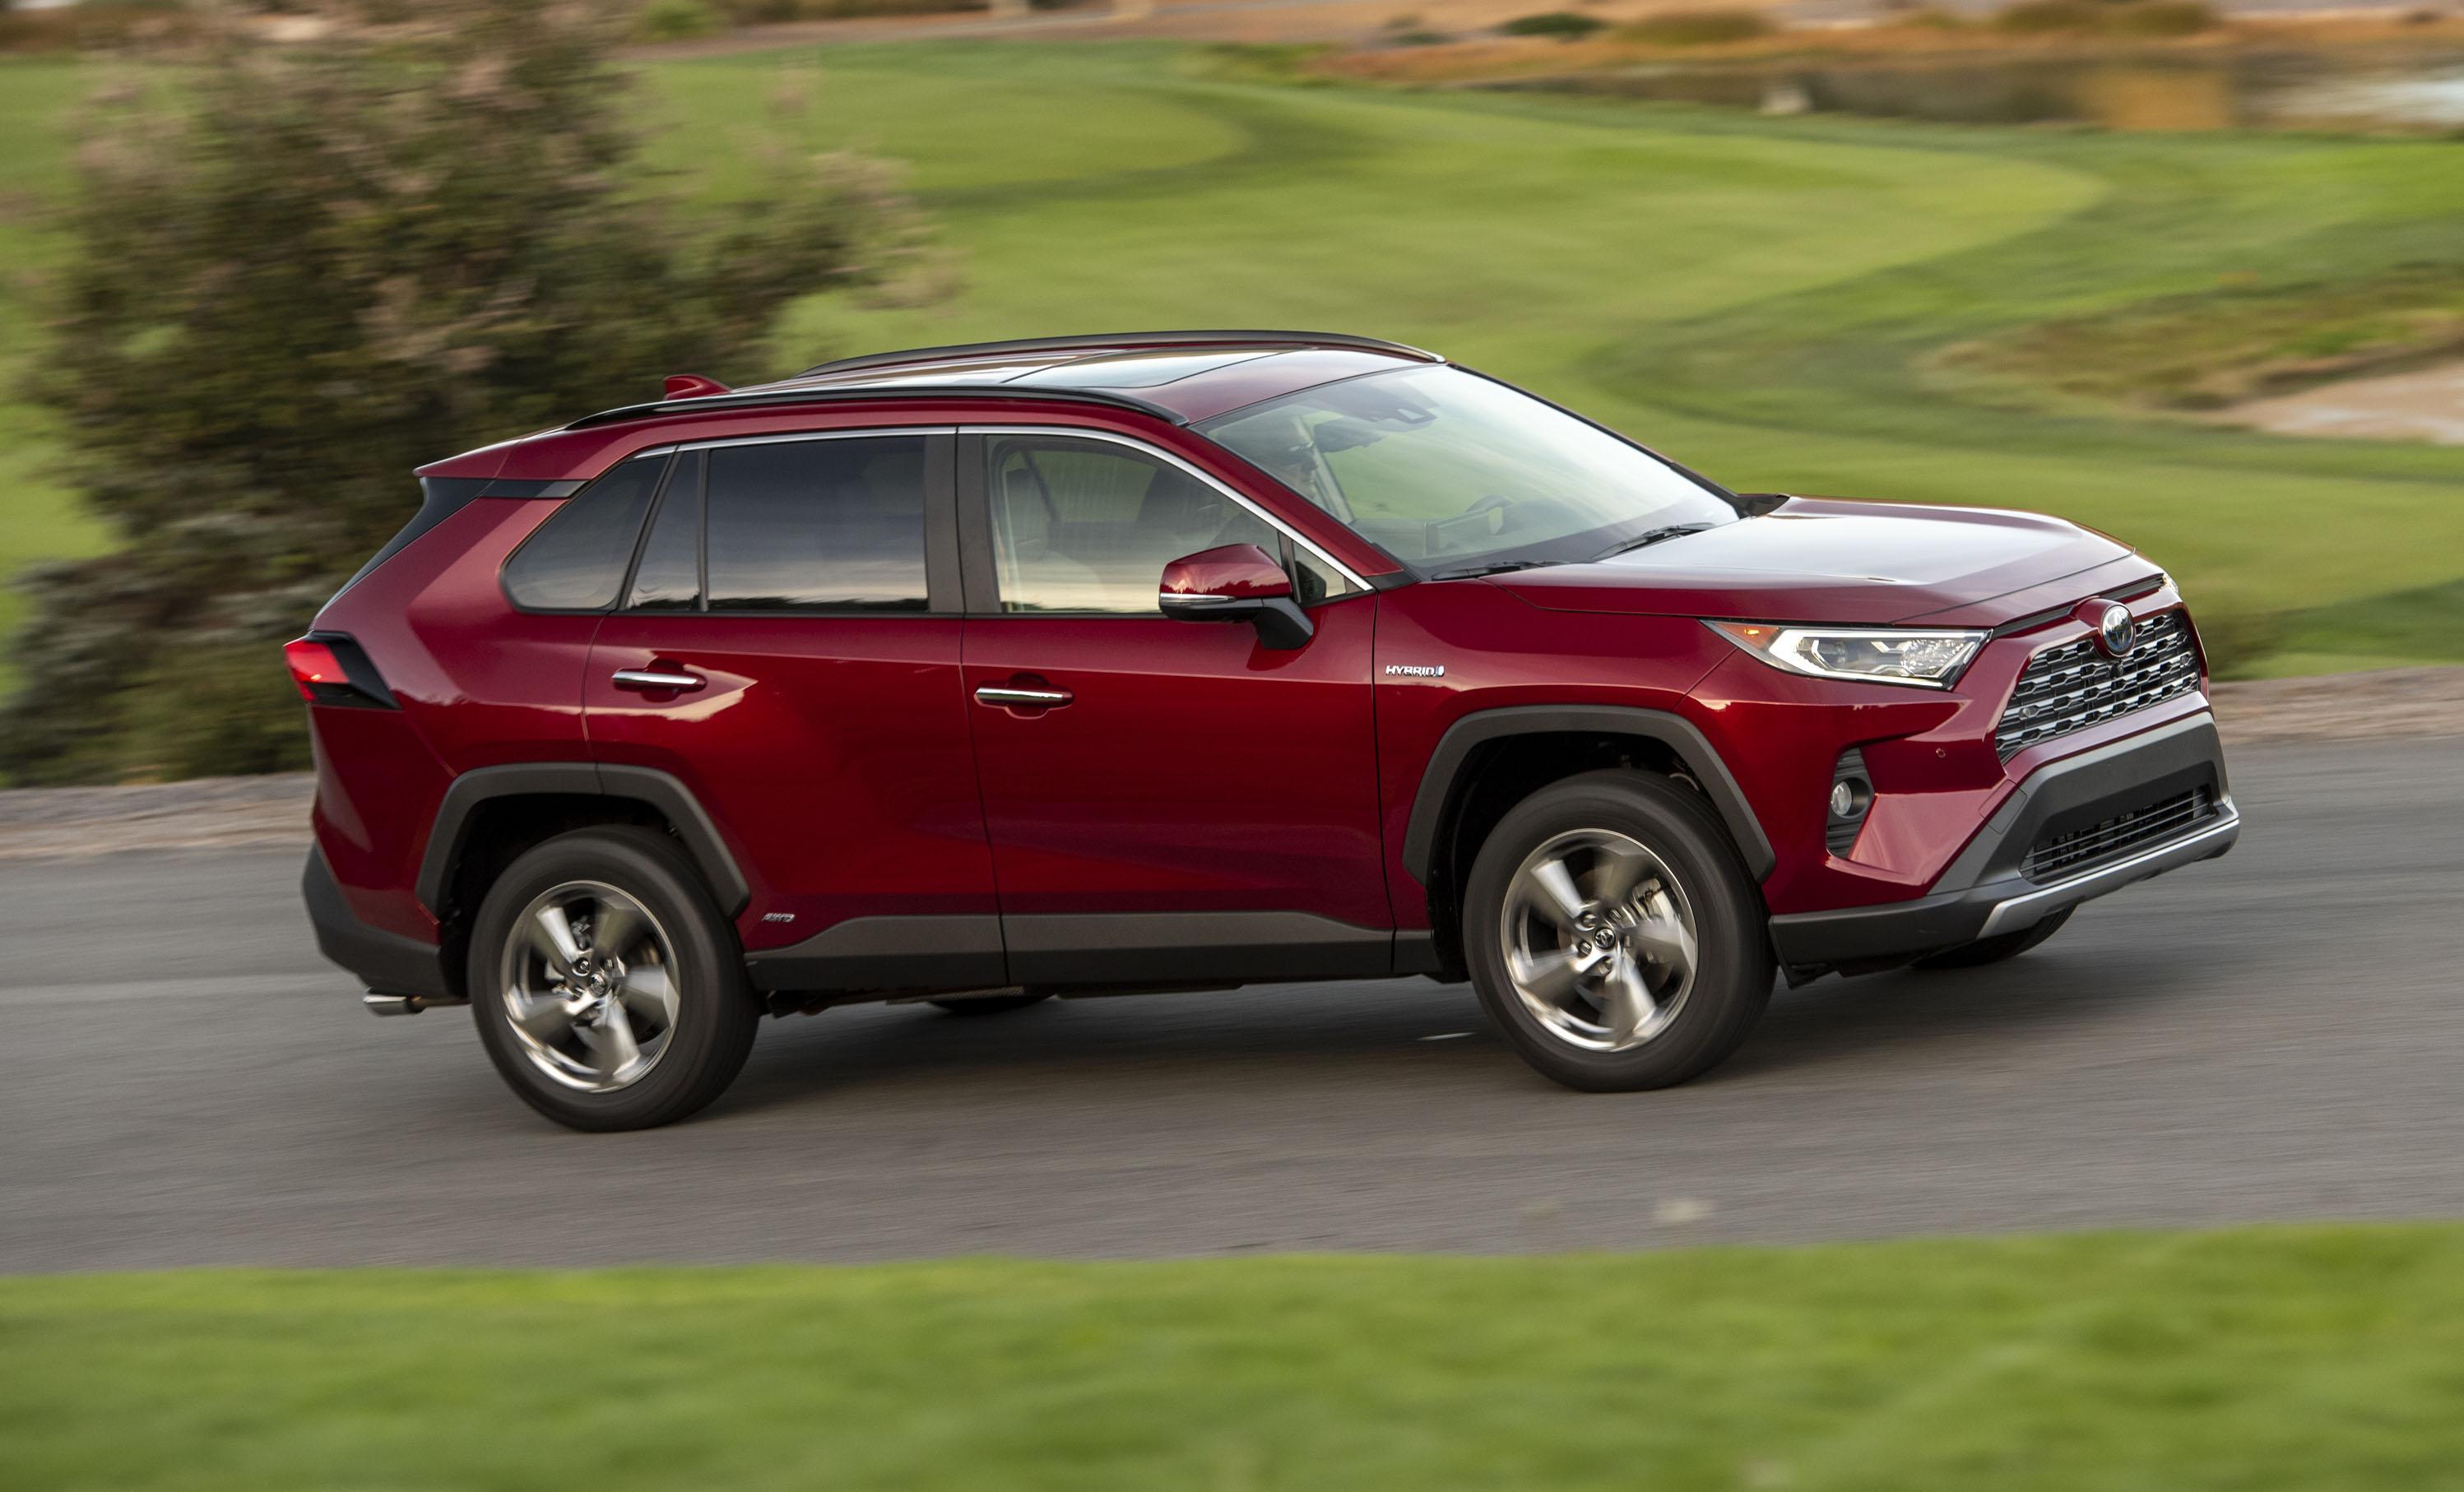 Used Toyota Rav4 For Sale >> 2019 Nissan Kicks, 2019 Toyota RAV4, 2019 Ford F-150 ...